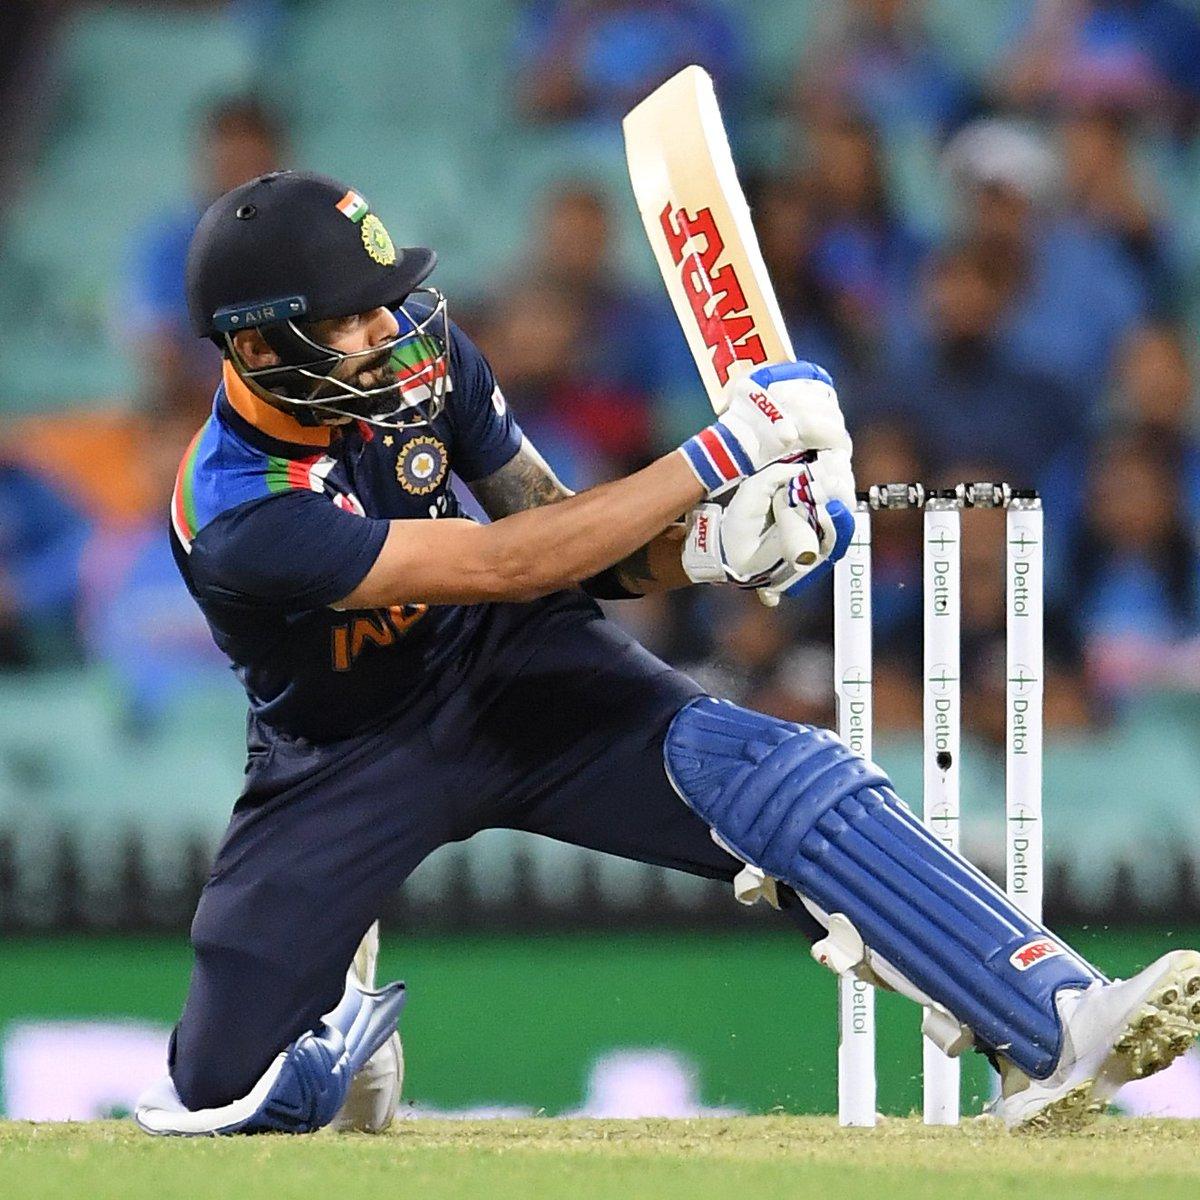 Virat Kohli or AB de Villiers? 🤯  Ridiculous shot from the Indian skipper! #AUSvIND